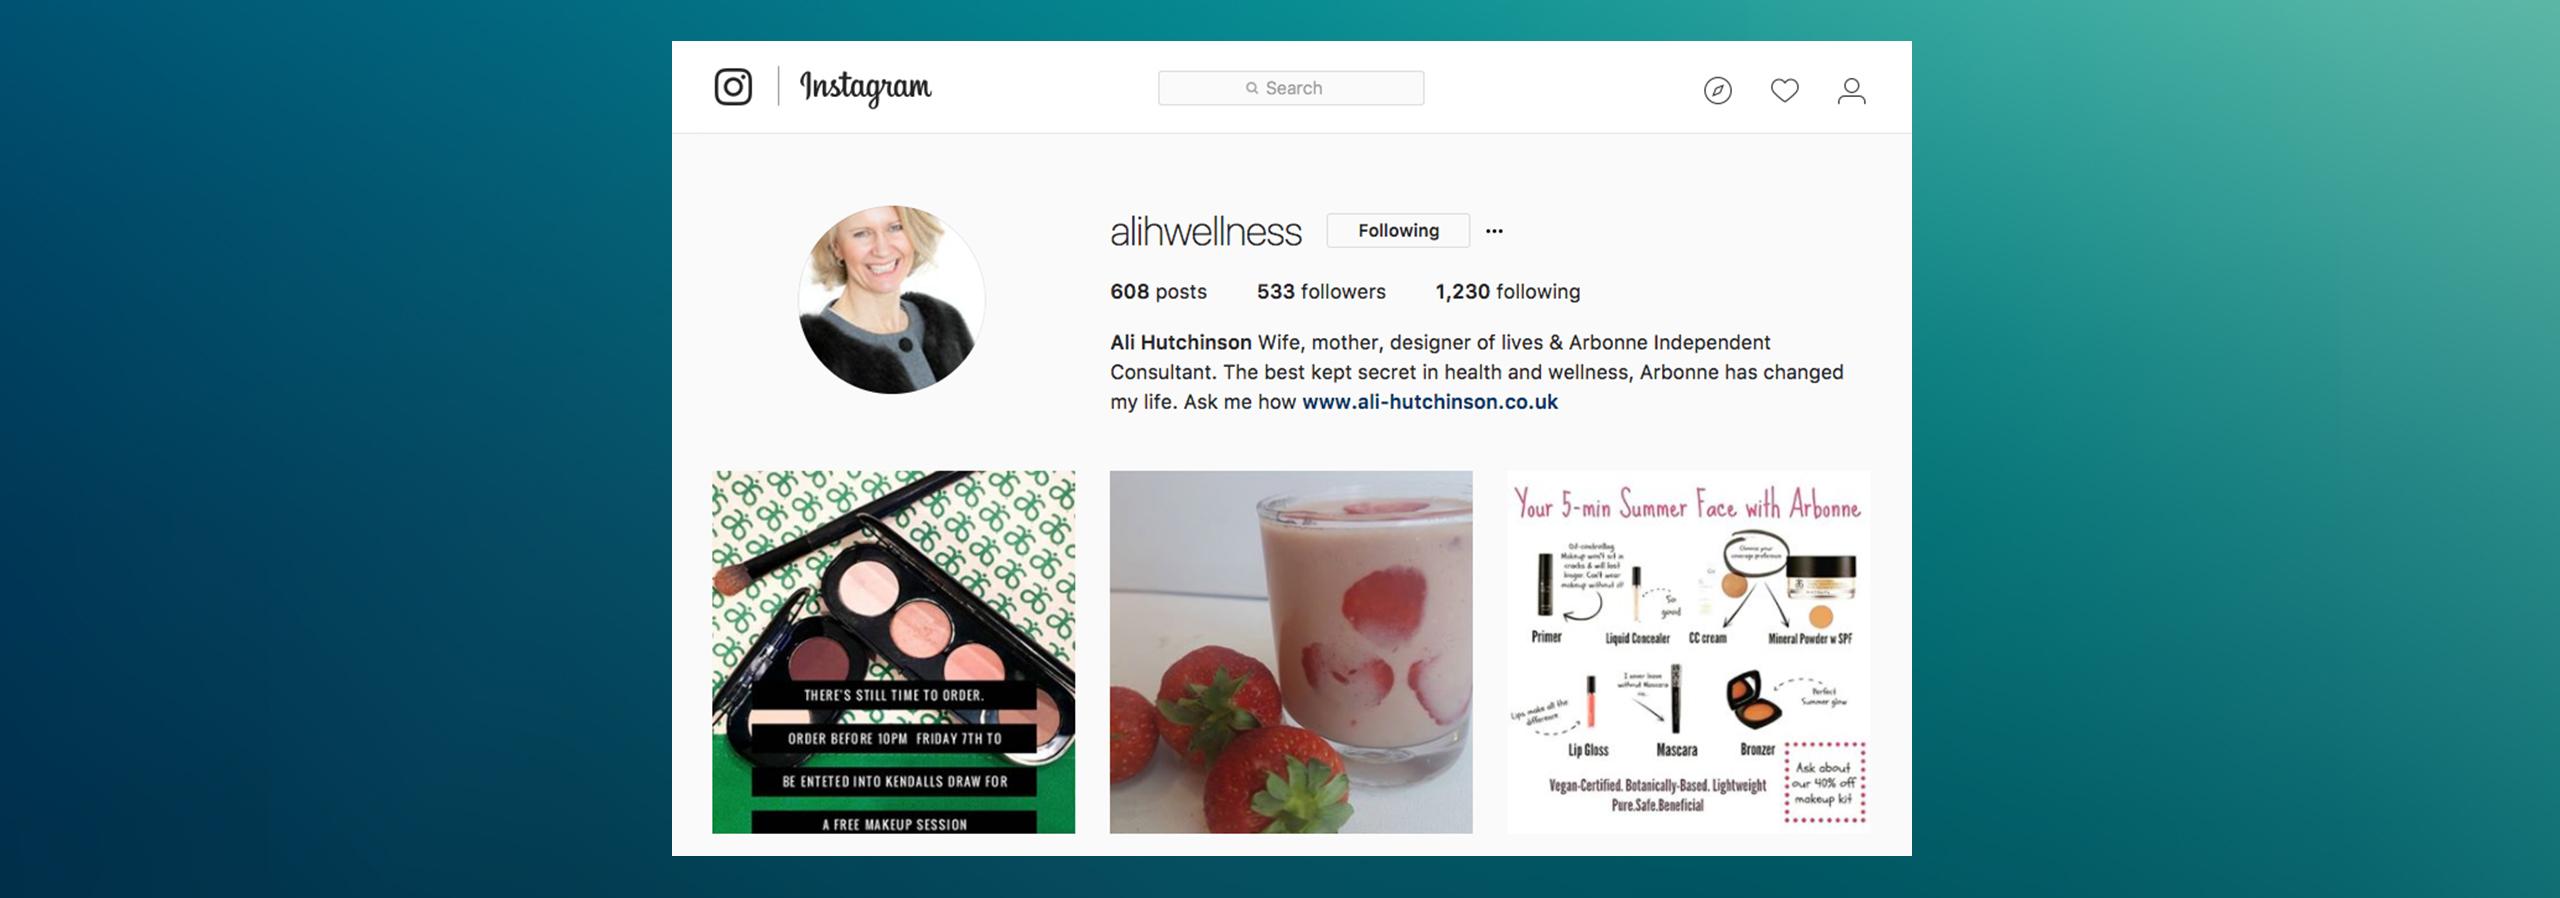 Social Media Campaign - Instagram